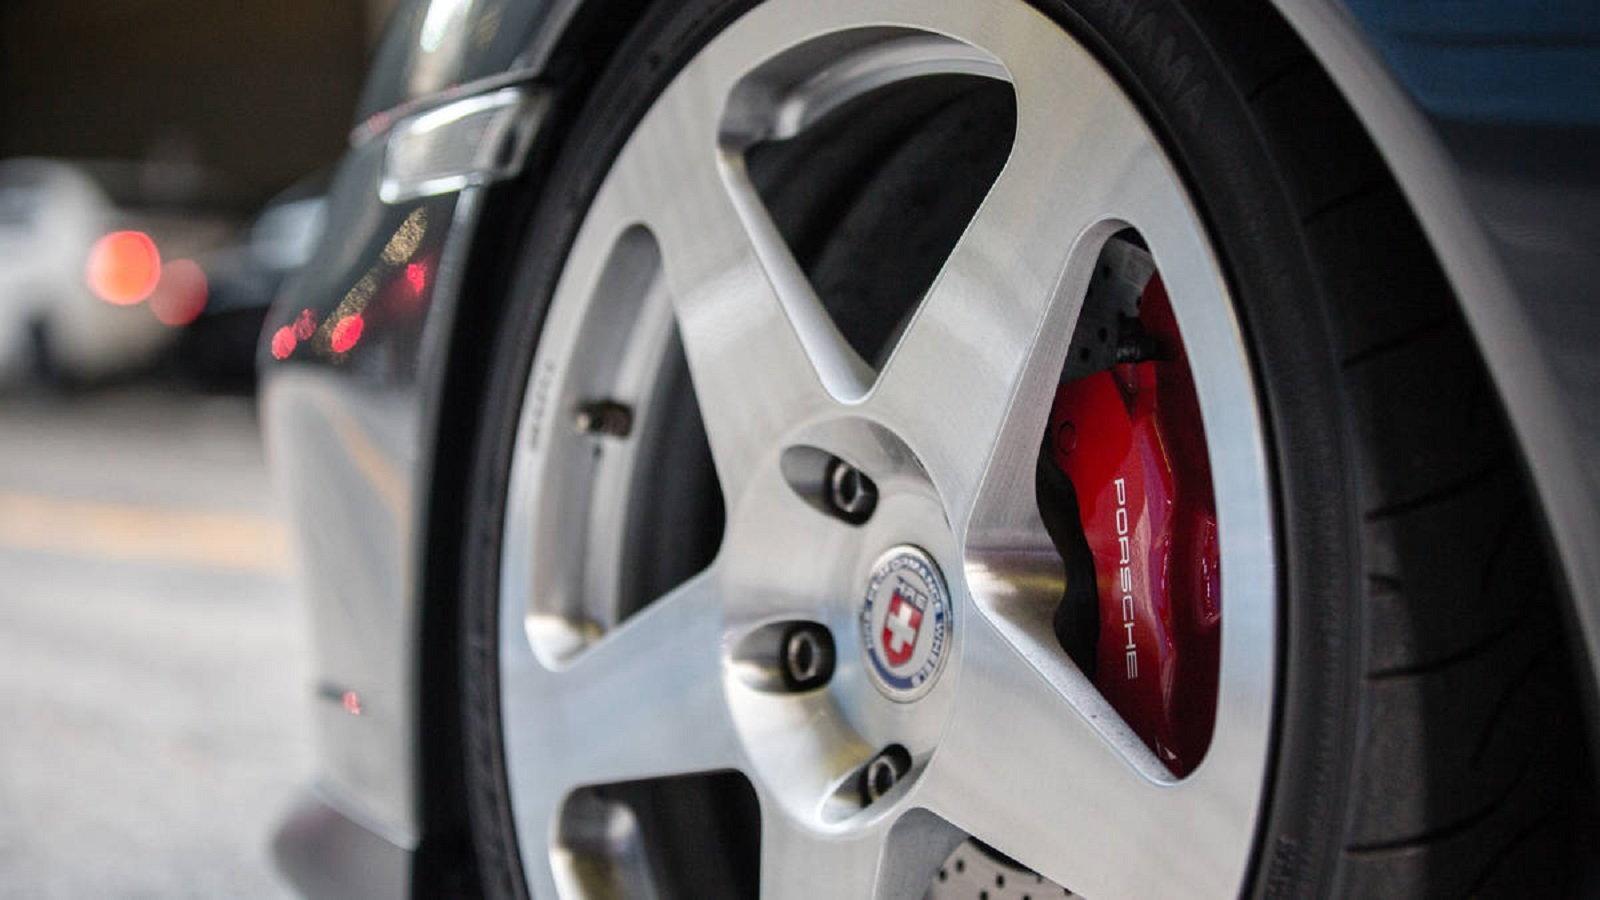 Photographer Larry Chen's Porsche 996 Turbo